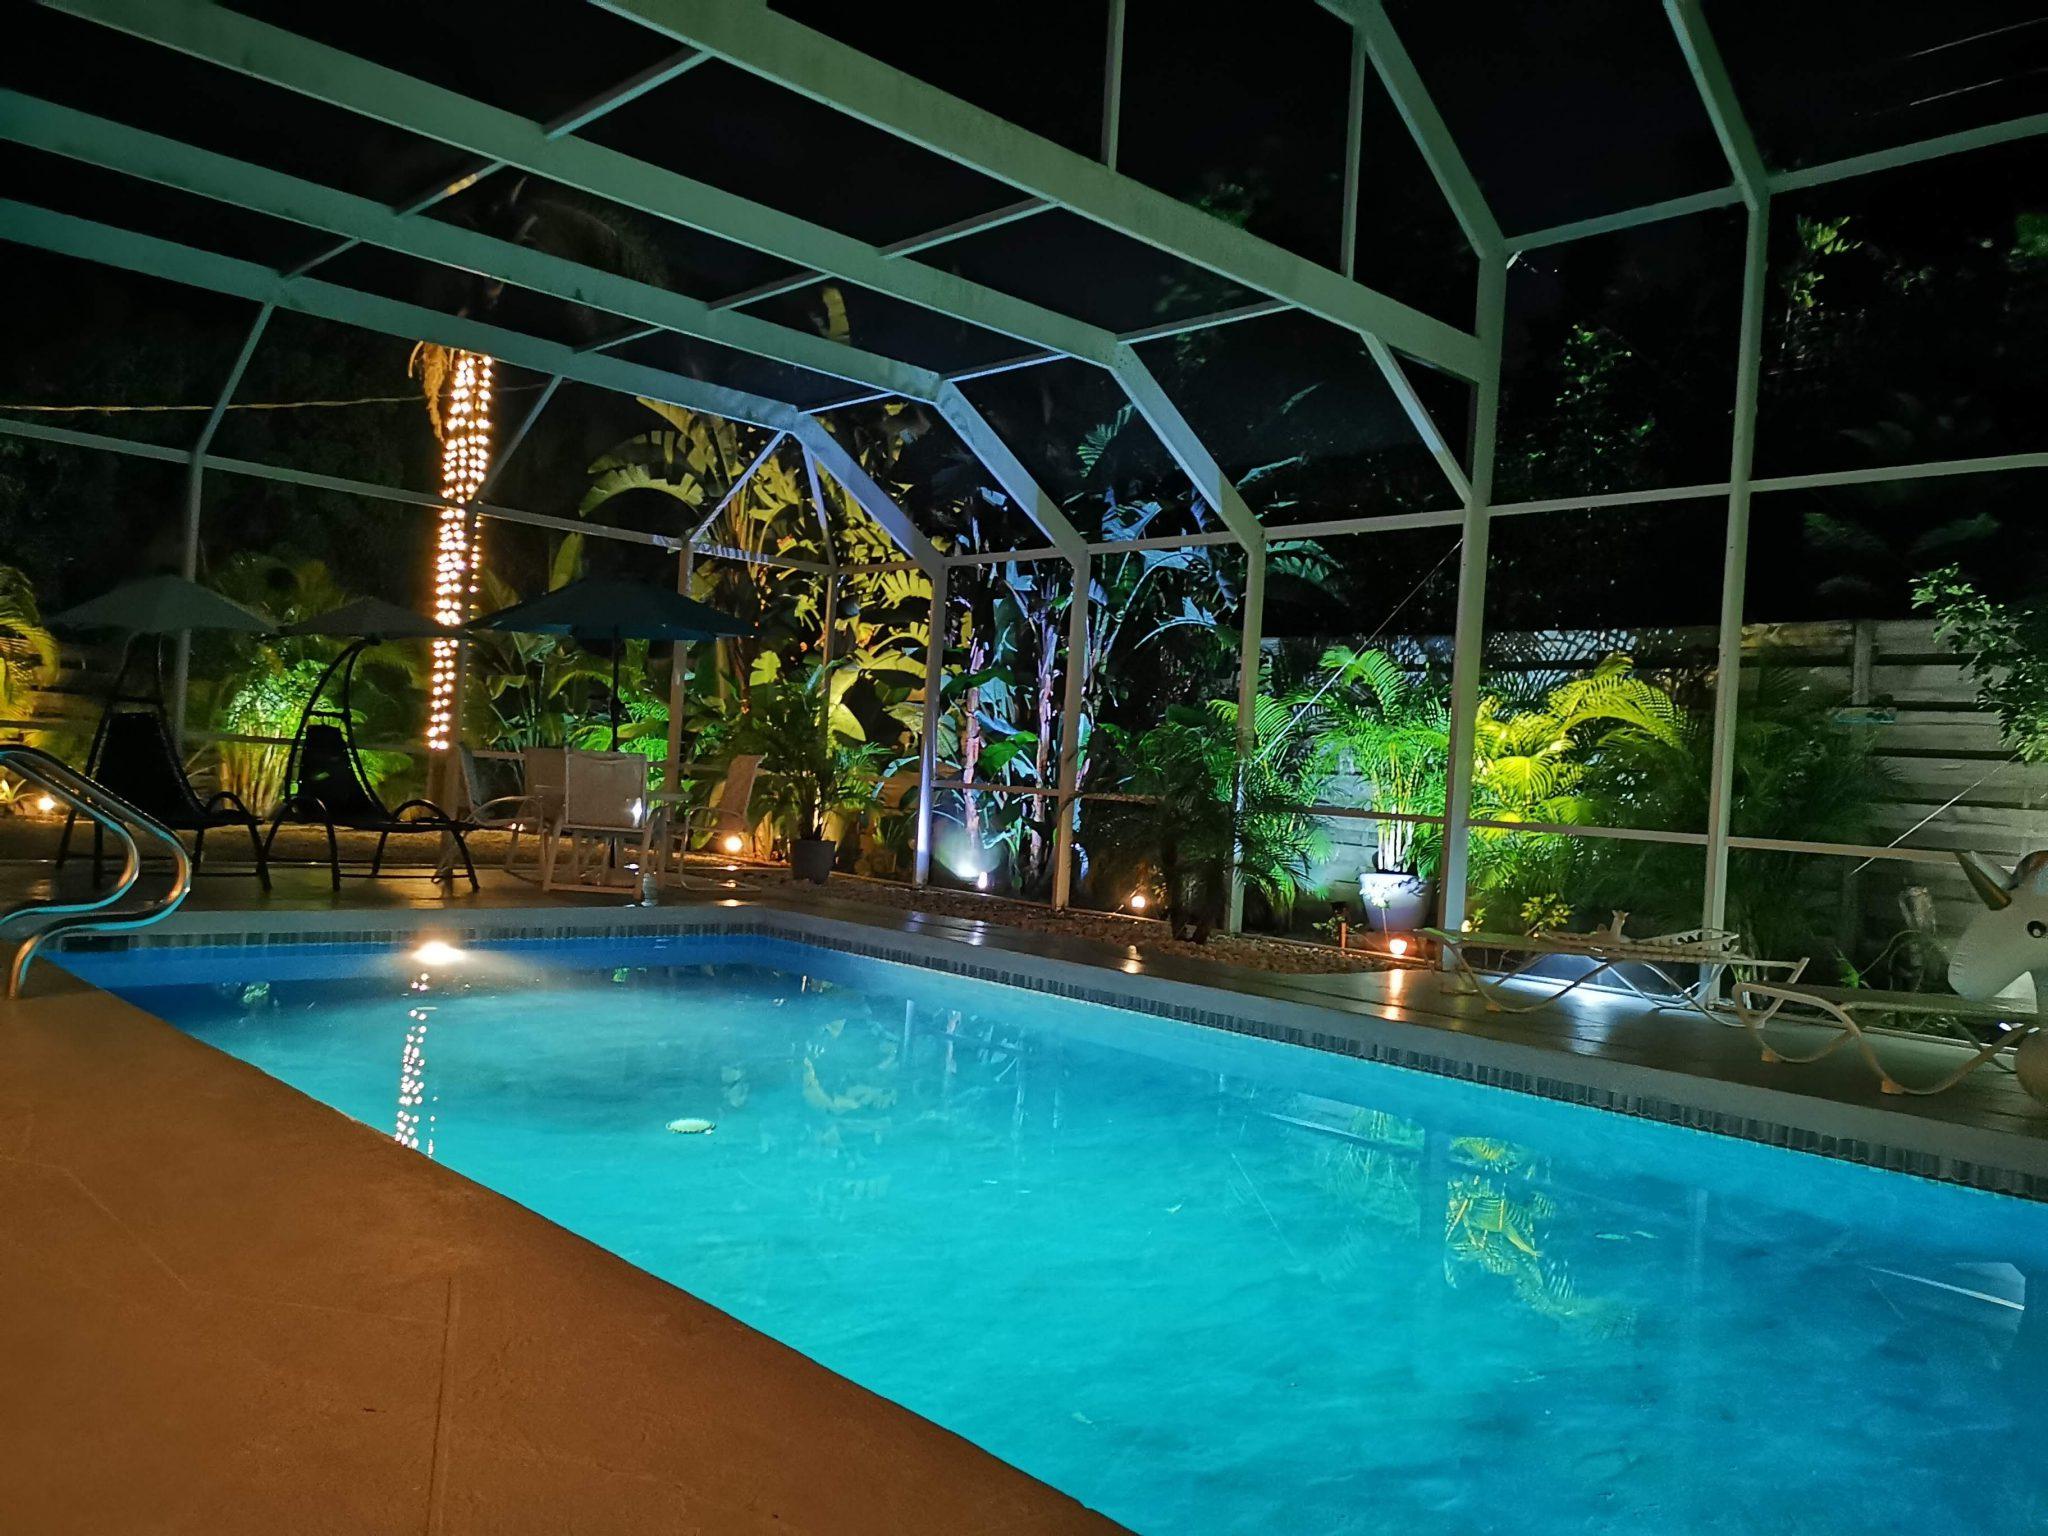 Villa colleen pool night